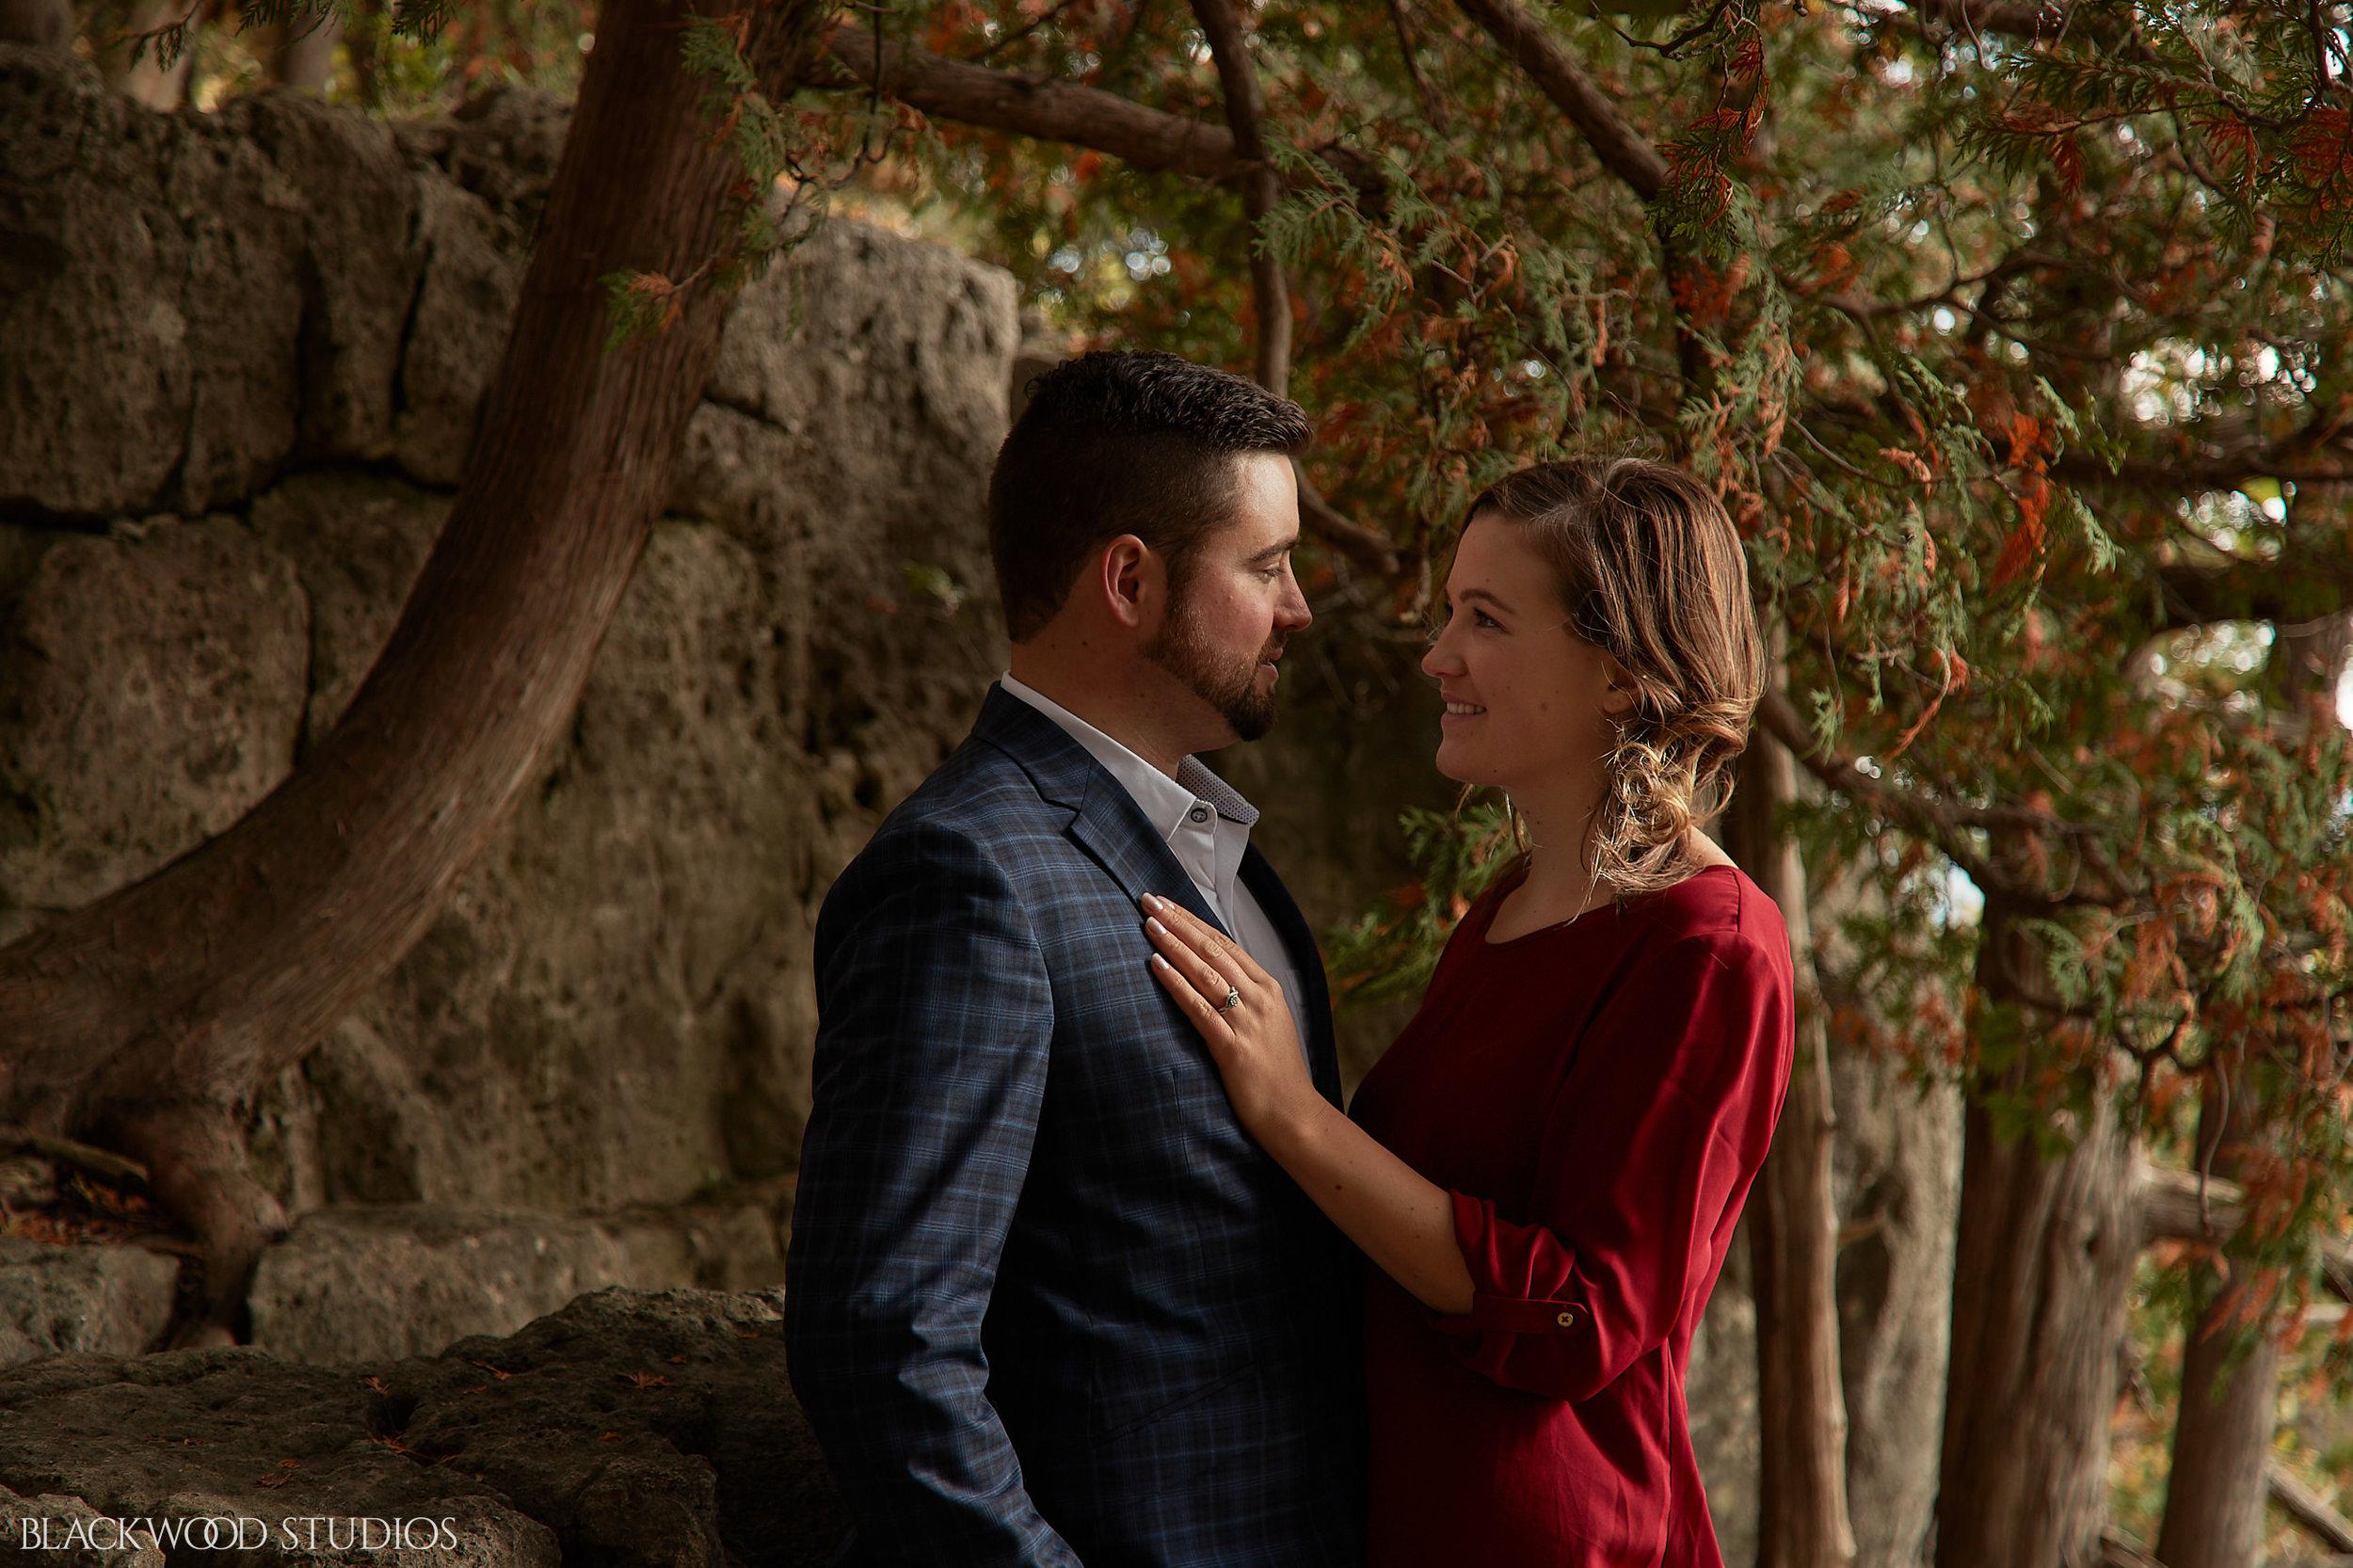 Blackwood-Studios-20181014-145750-Dave-and-Natalie-Engagement-0026-Rattlesnake-Point-Conservation-Area-Milton-Ontario.jpg